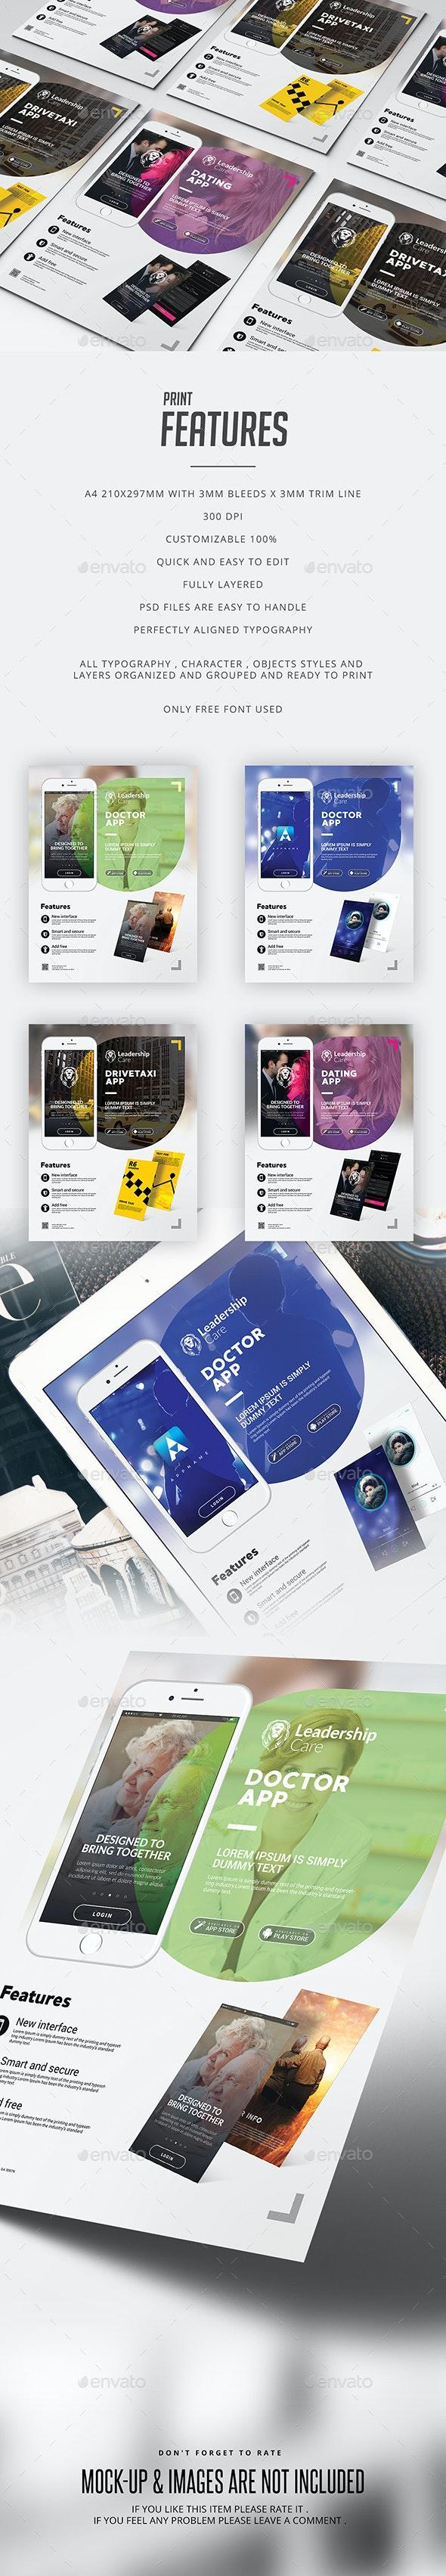 Mobile App Flyer Template - Print Templates